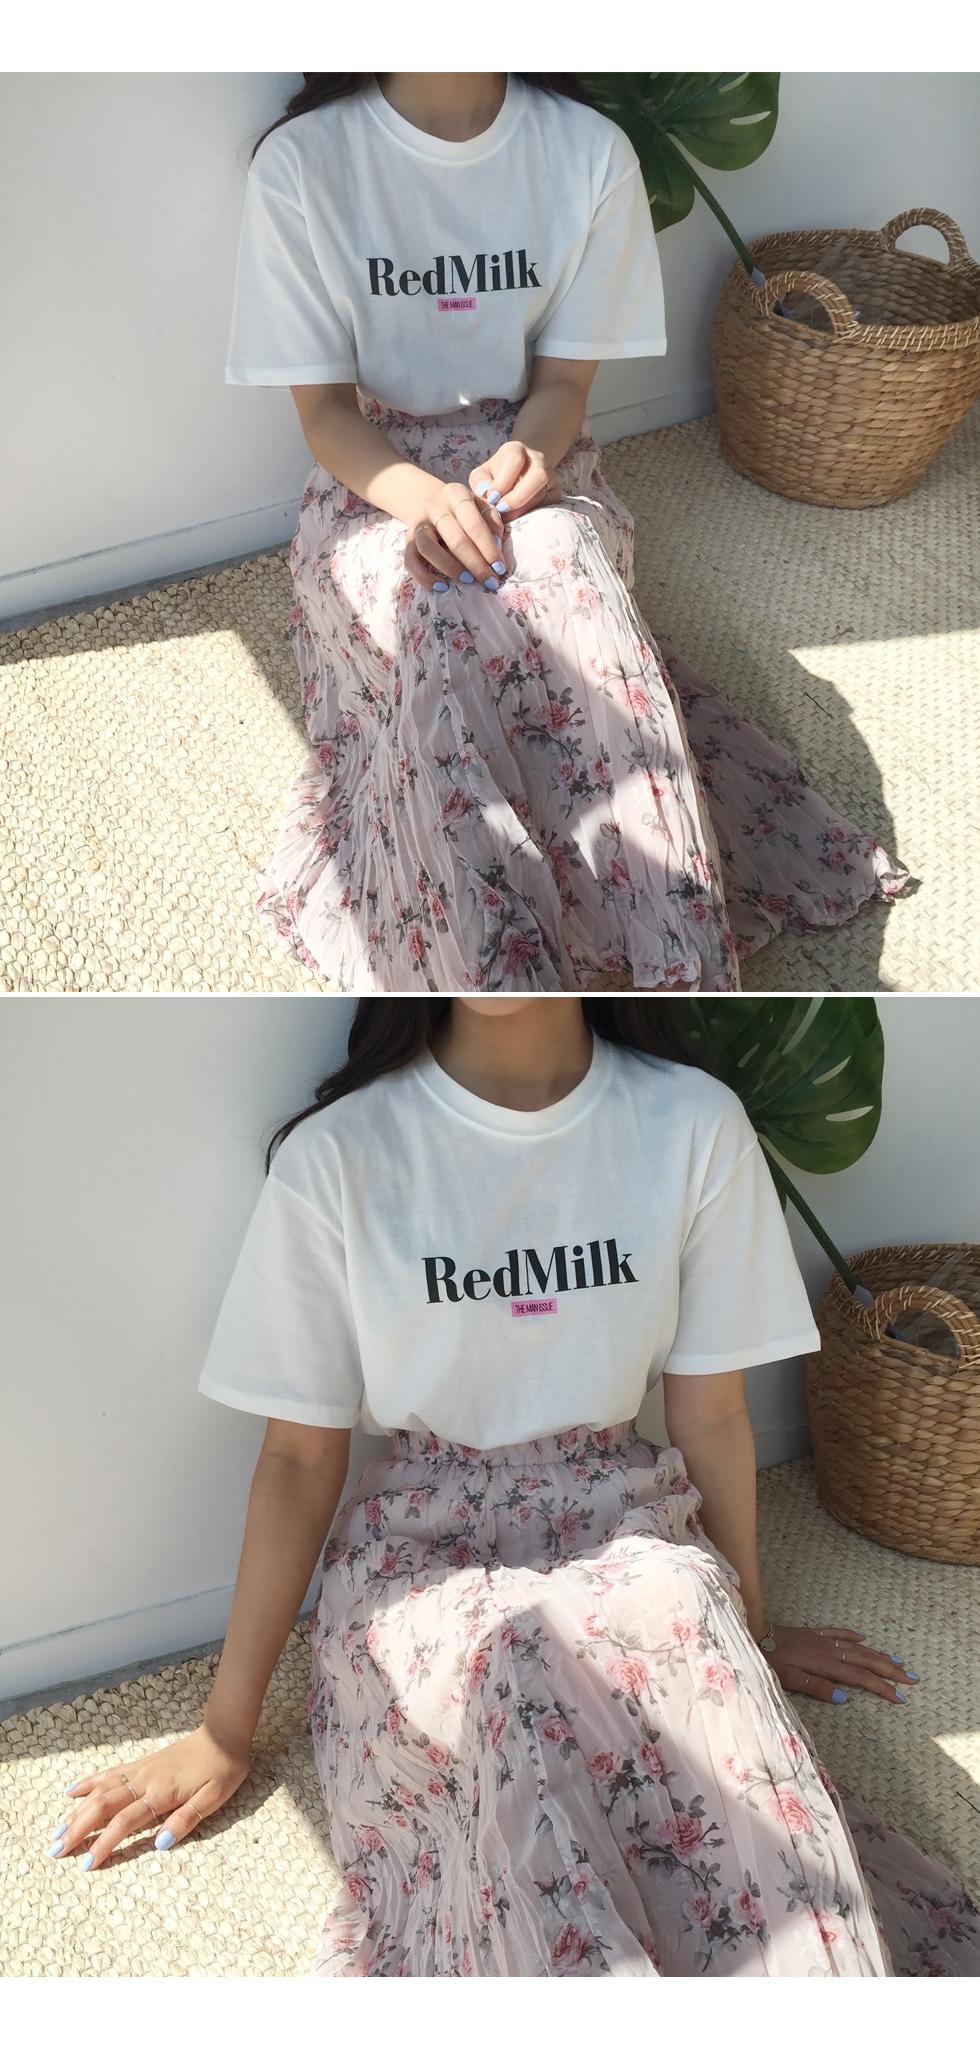 Rose pleated skirt